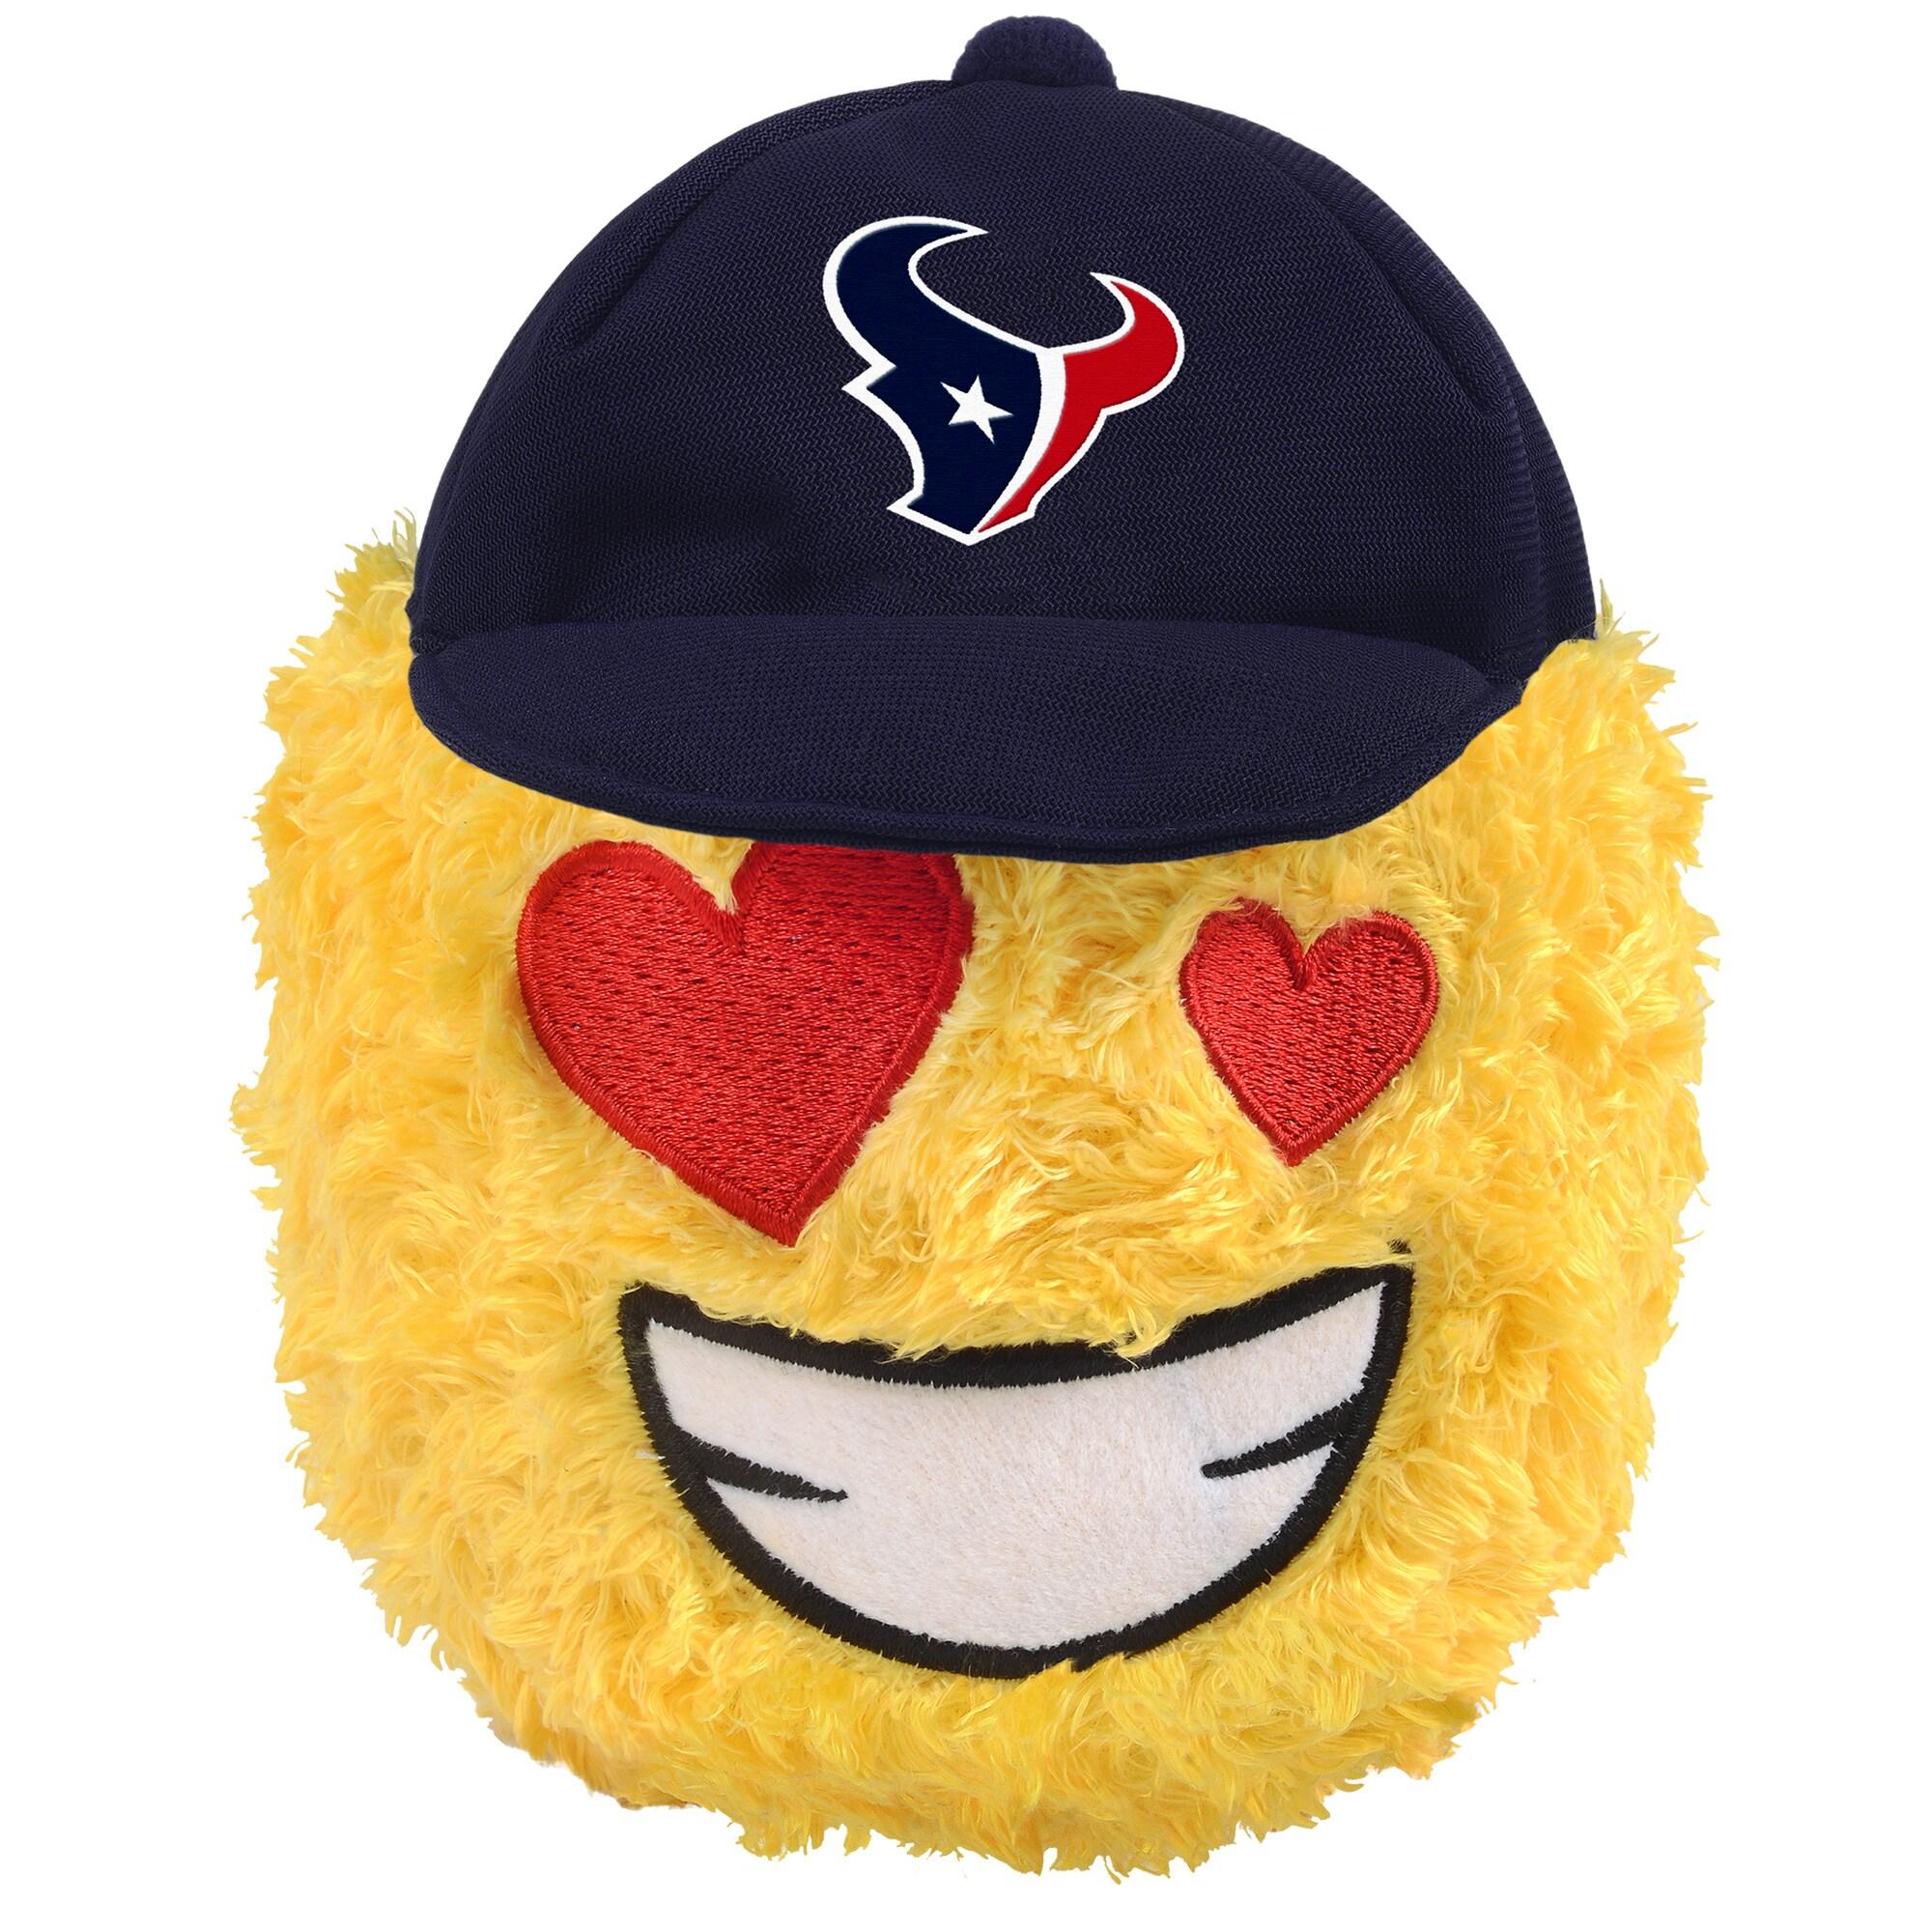 "Houston Texans 5"" Heart Eyes Teamoji Plush Toy"